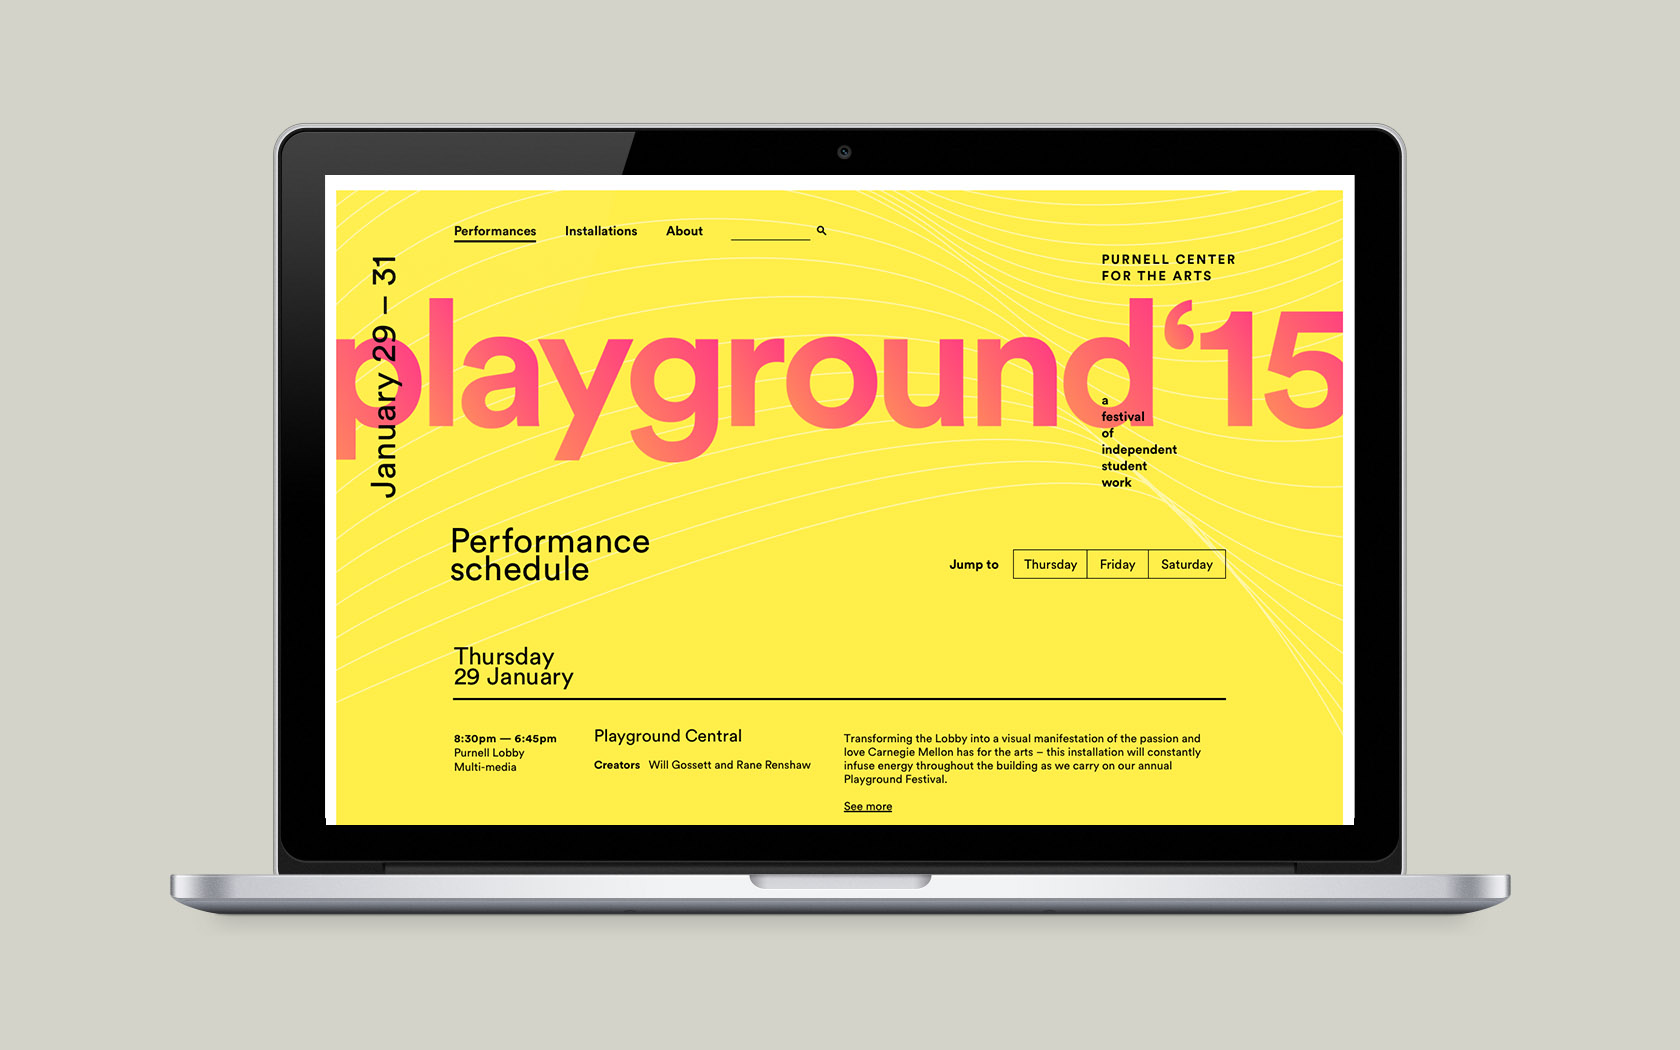 Playground — 2015 School of Drama Student Festival